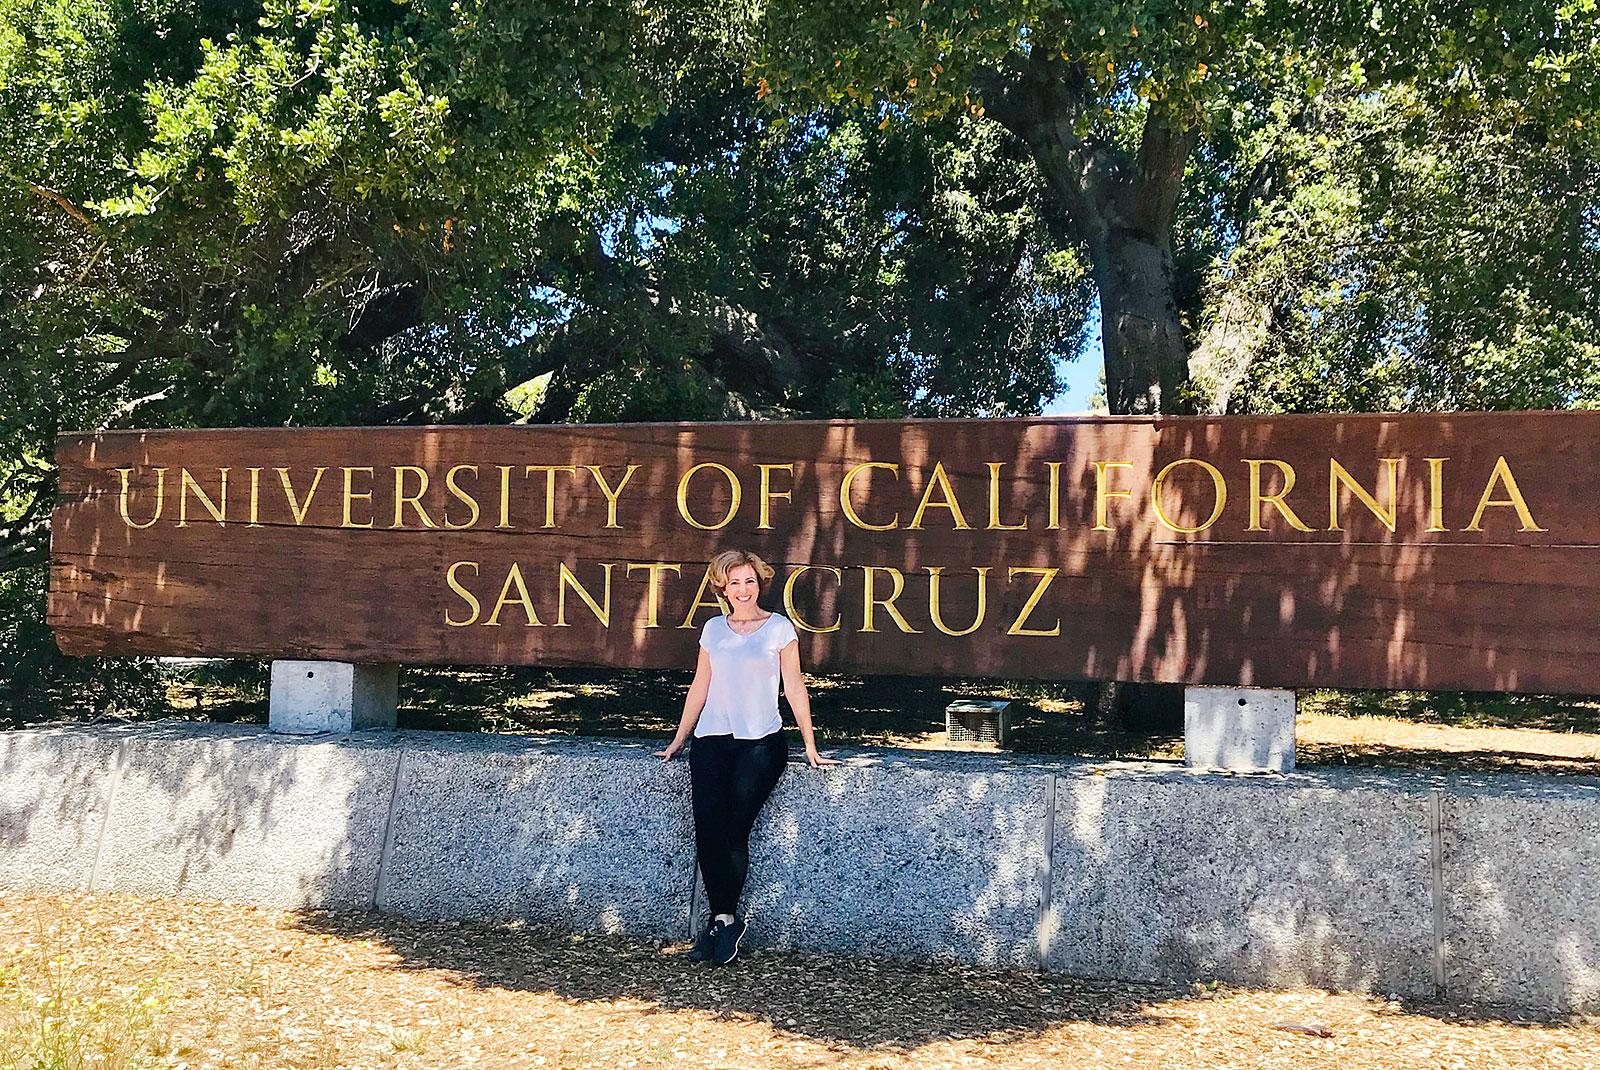 rita-aleluia-painel-madeira-universidade-santa-cruz-california